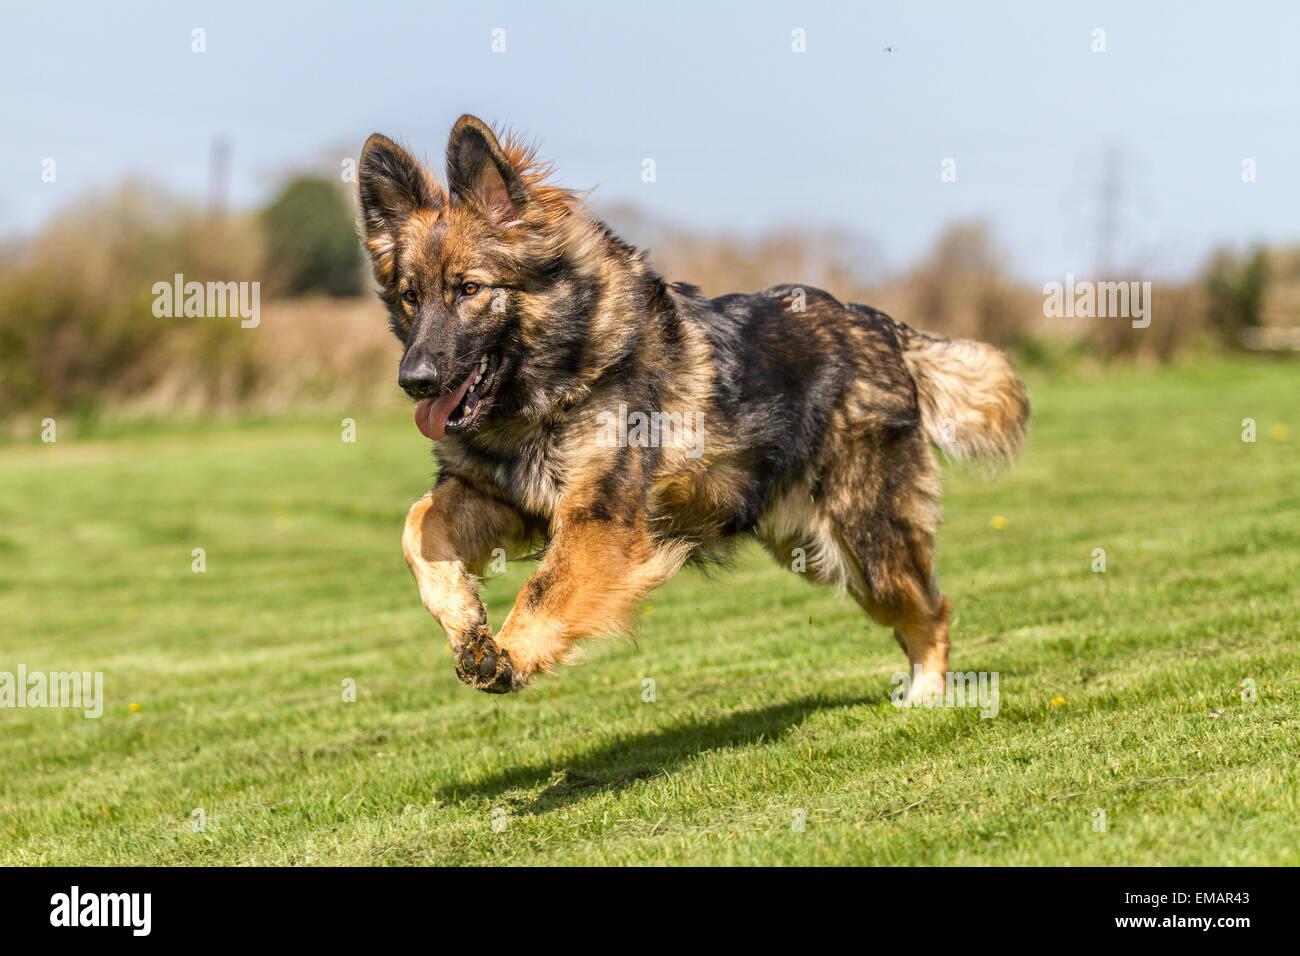 German Shepherd Dog running bouncing across grass. - Stock Image